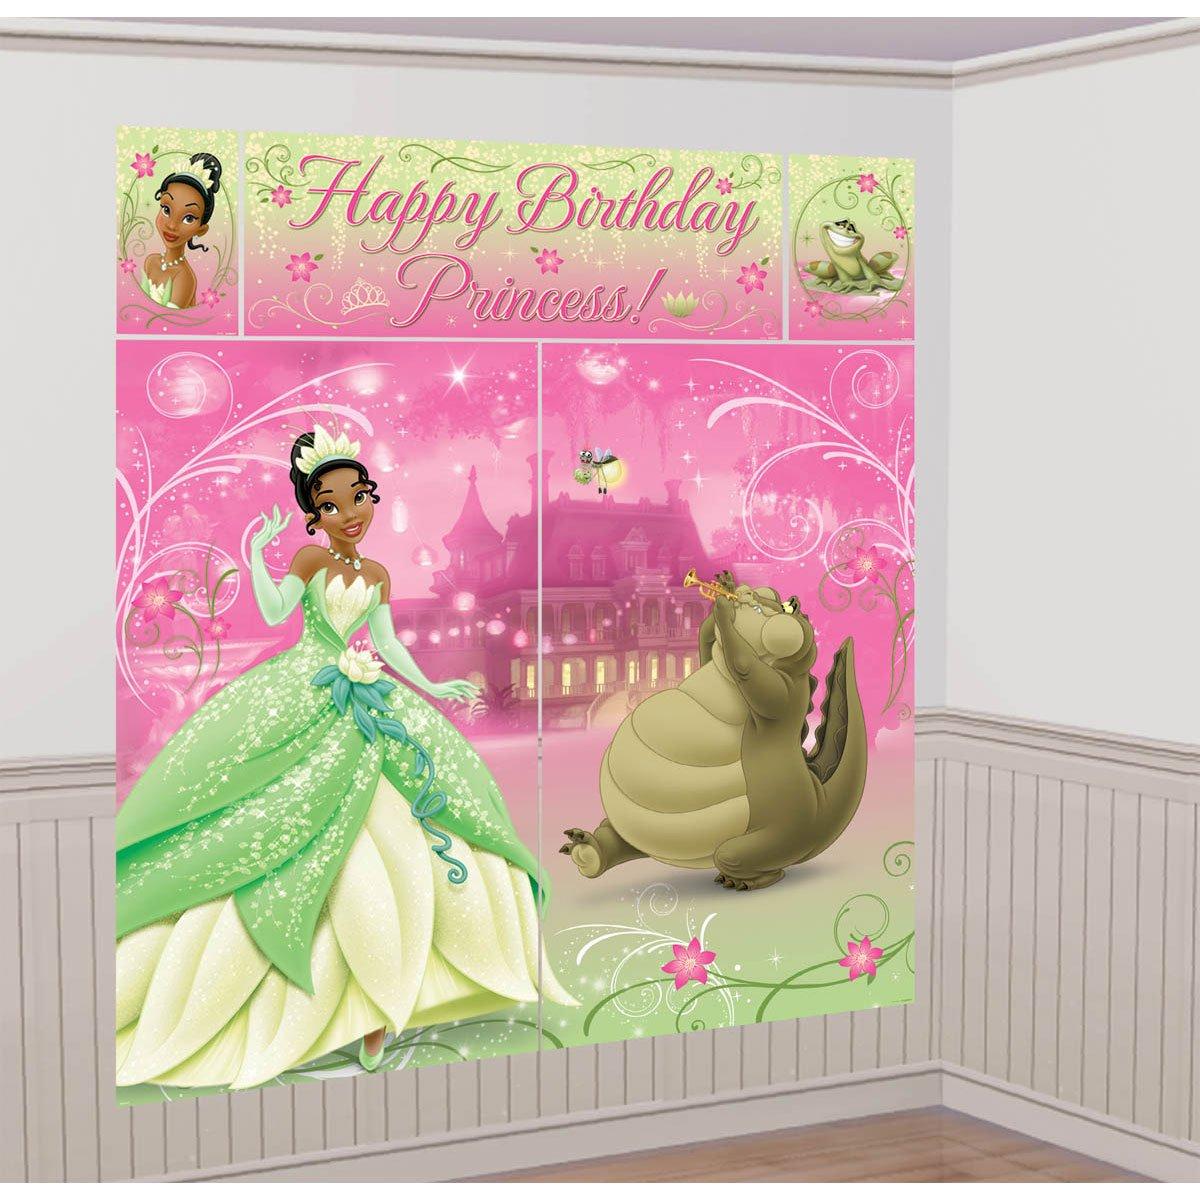 Princess And The Frog Bedroom Decor Amazoncom Princess And The Frog Sparkle Giant Scene Setter